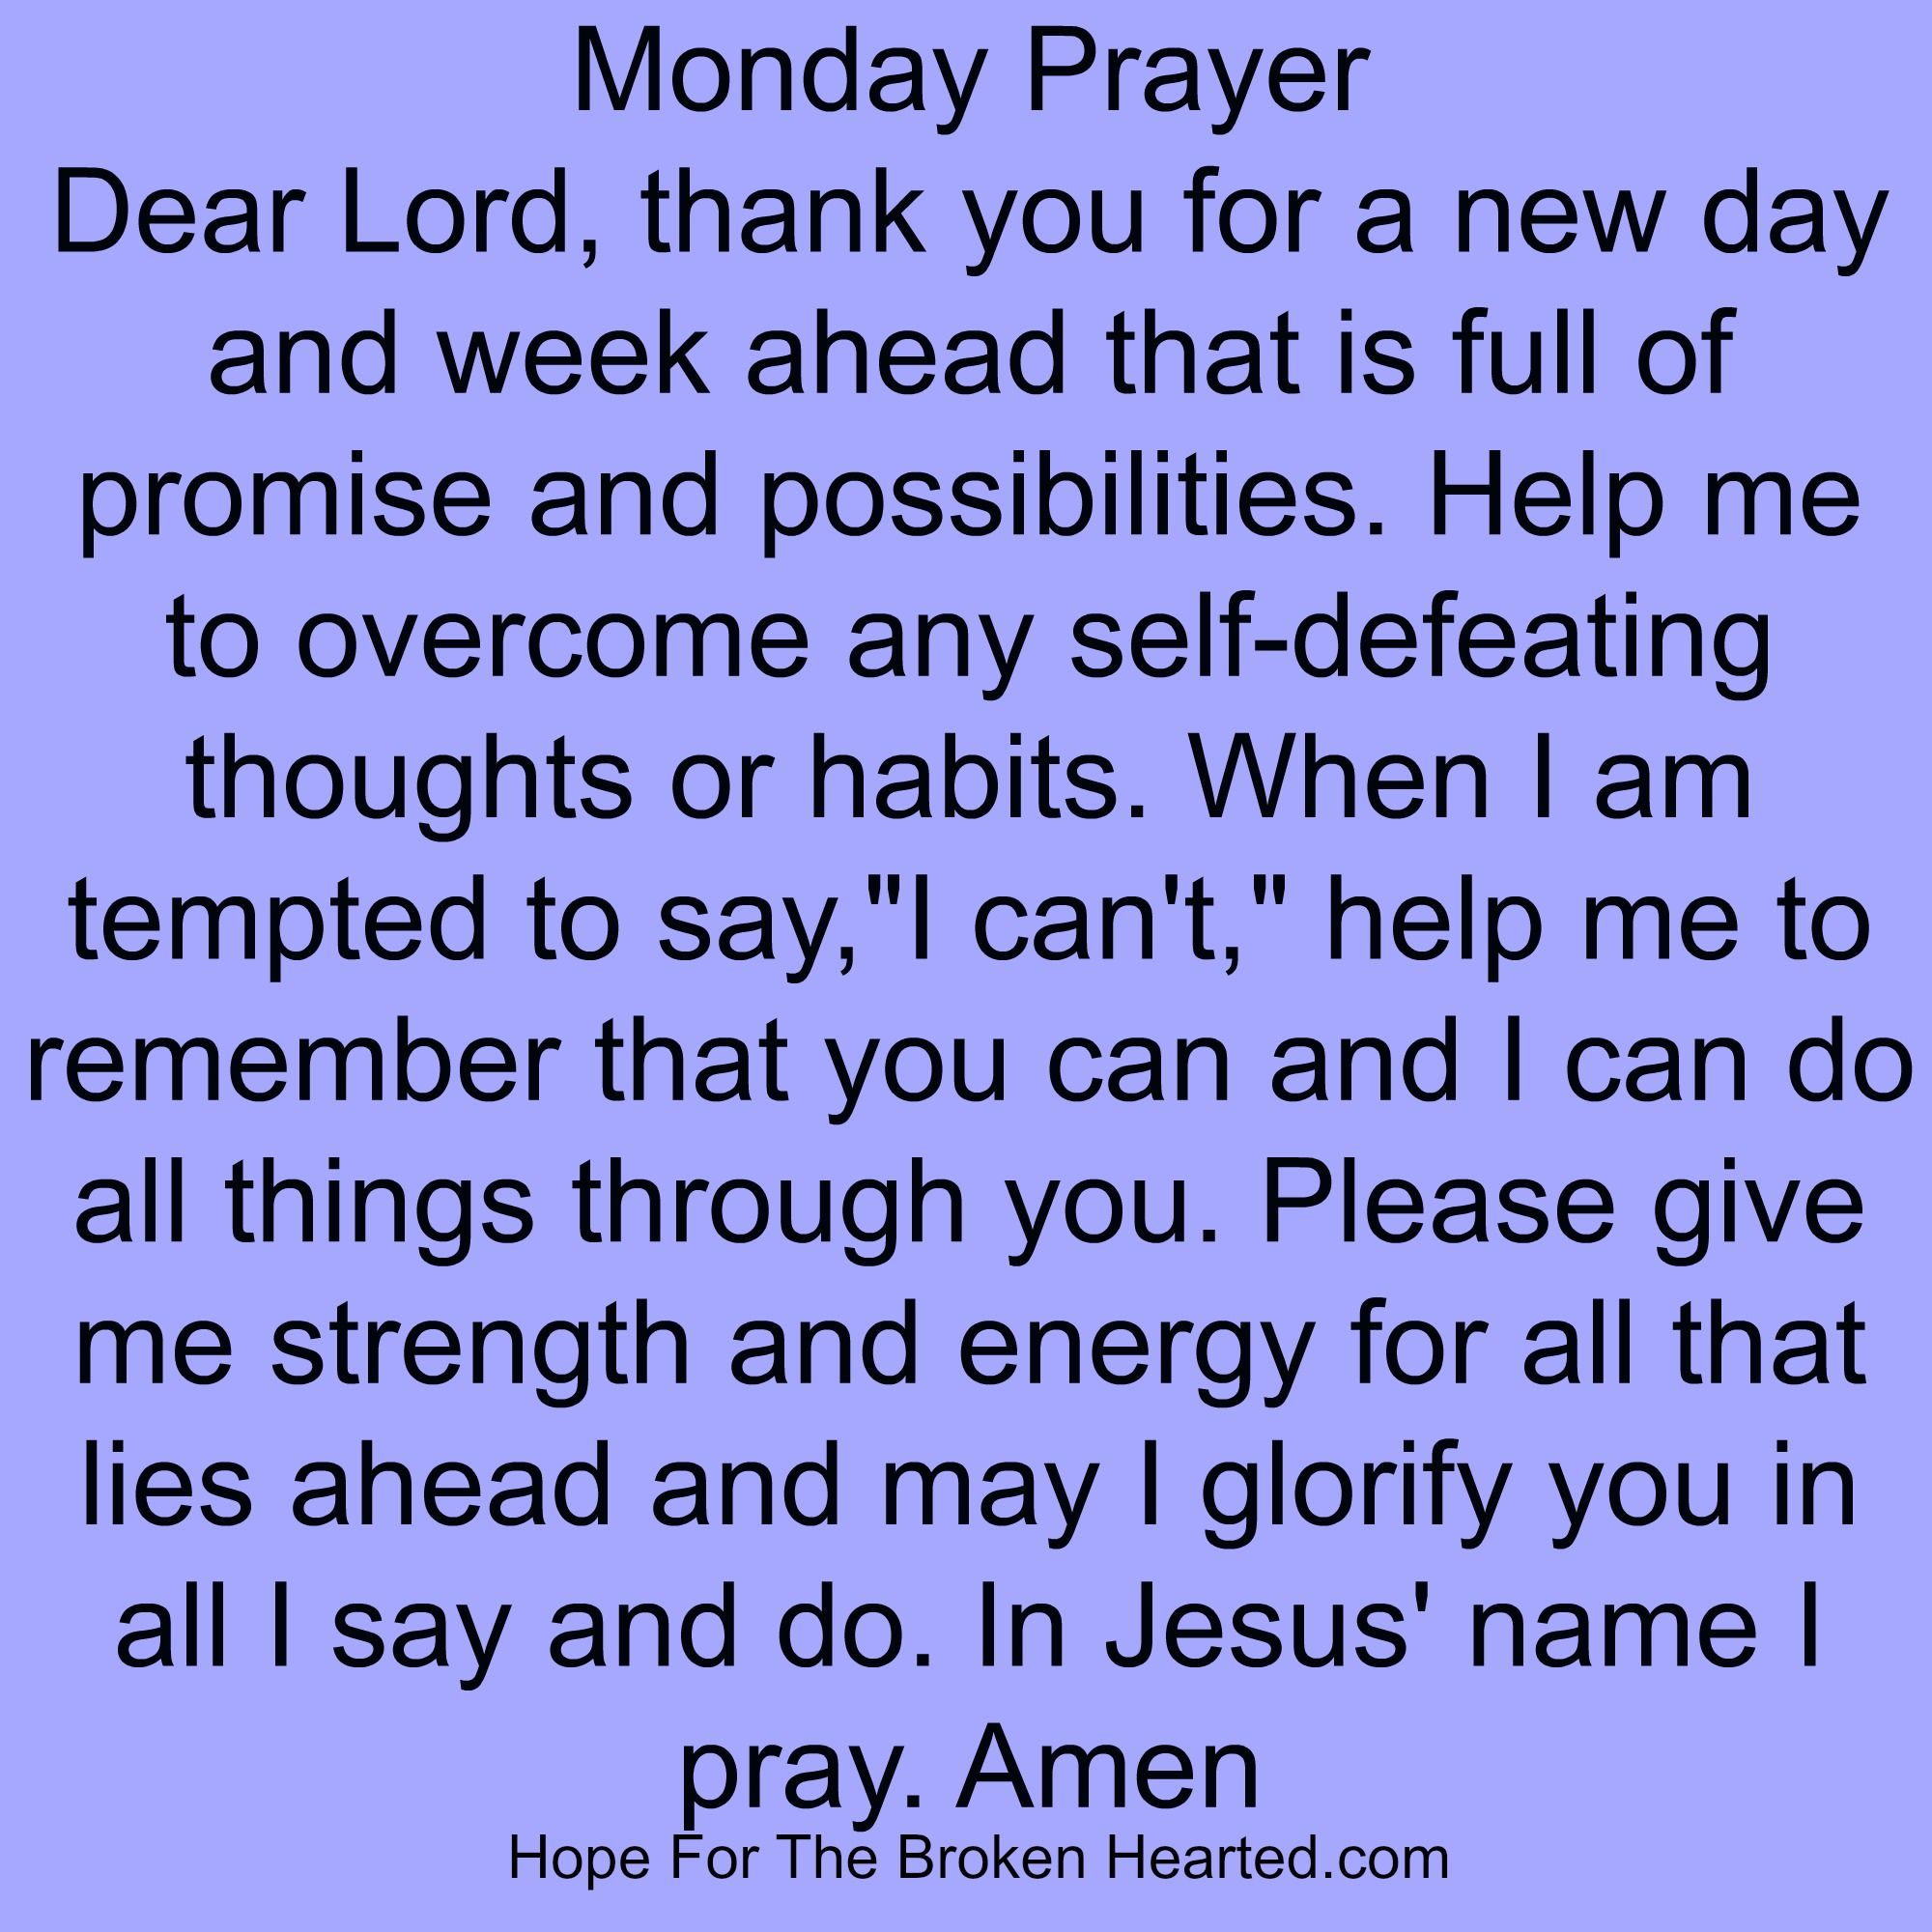 Todays Prayer Quotes Monday Prayer  Prayers  Pinterest  Mondays Daily Prayer And